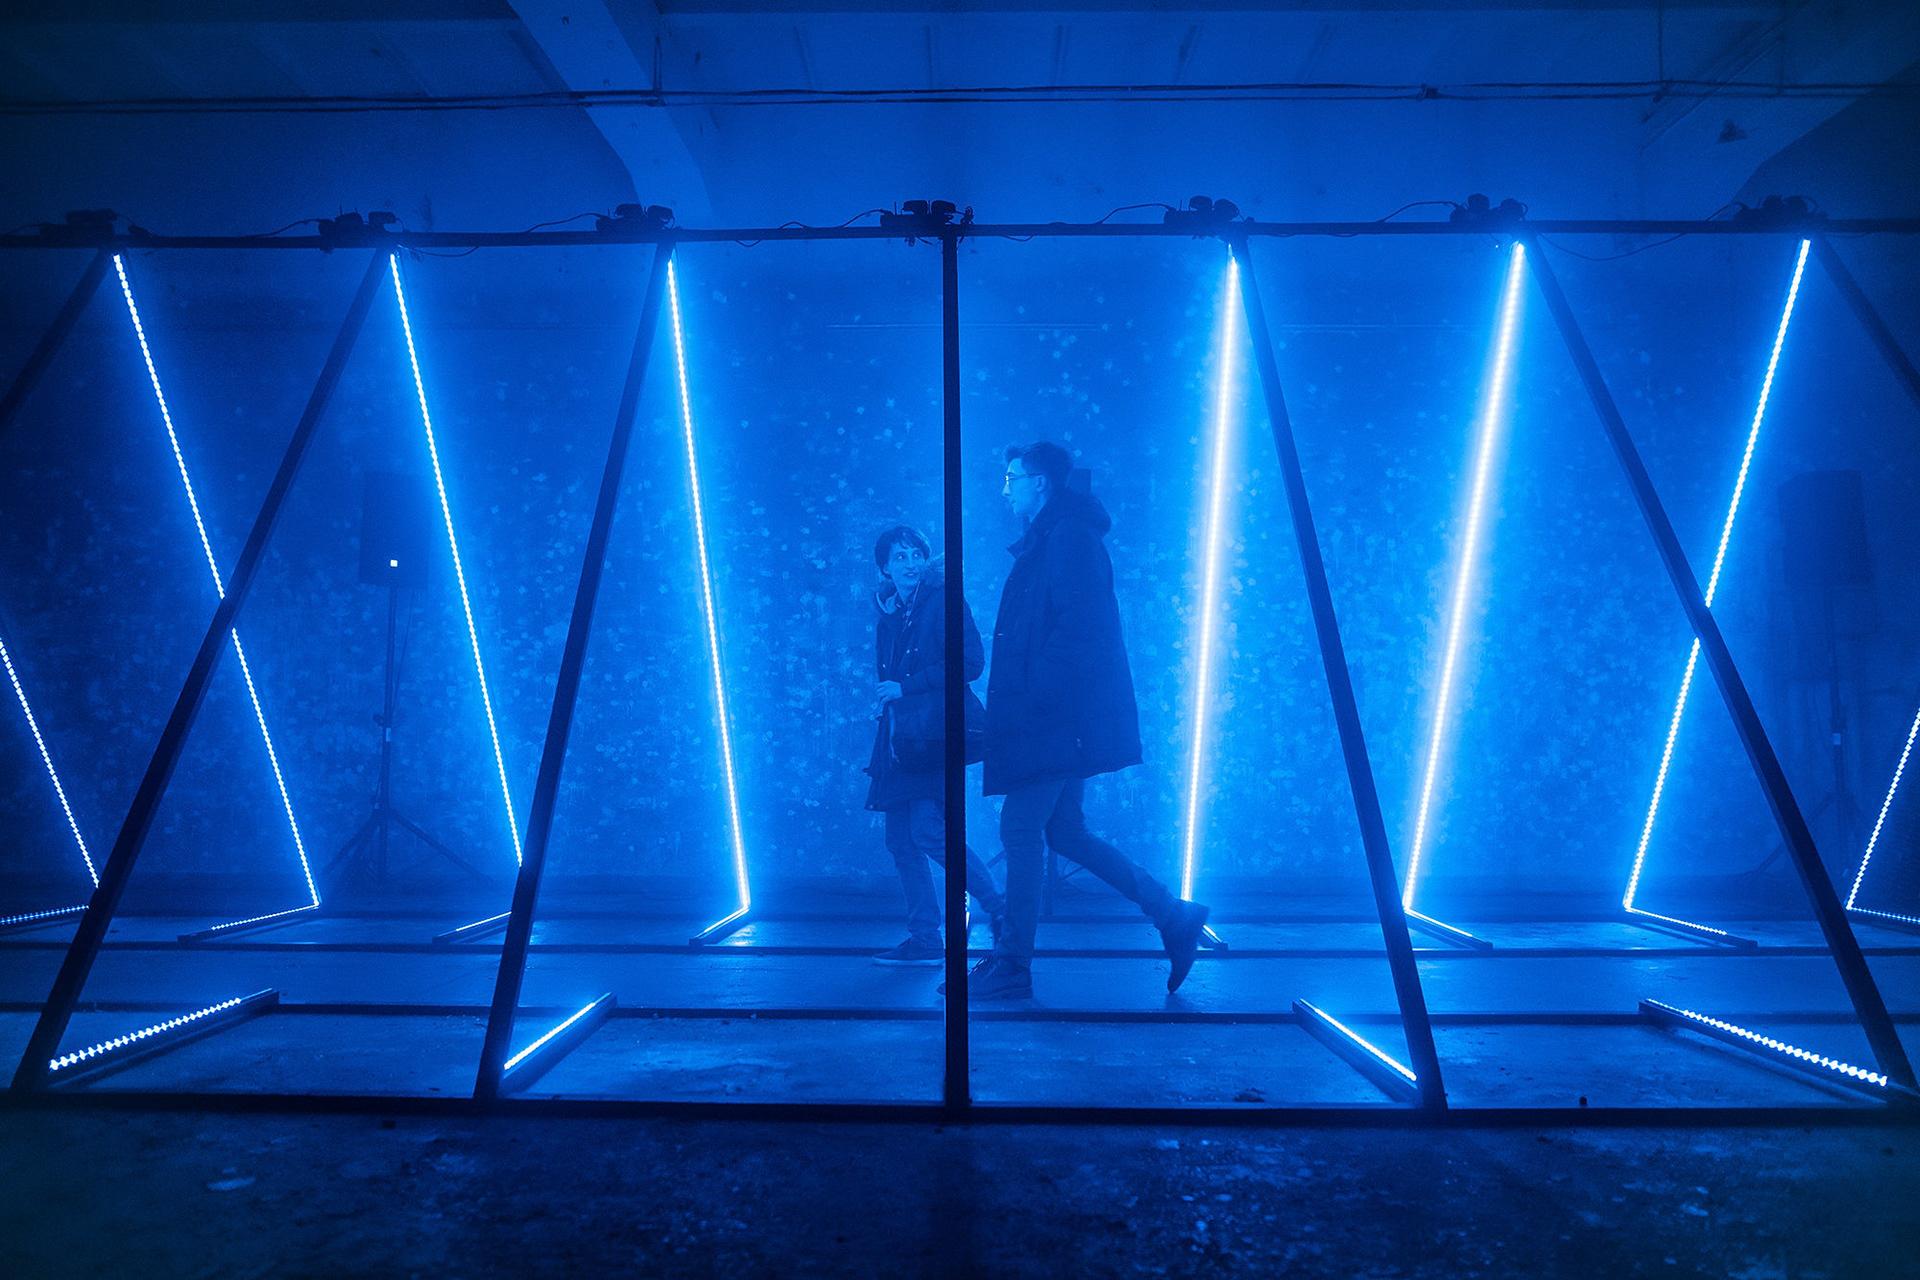 TRIANGLED: Immersive Light Installation - Set Design